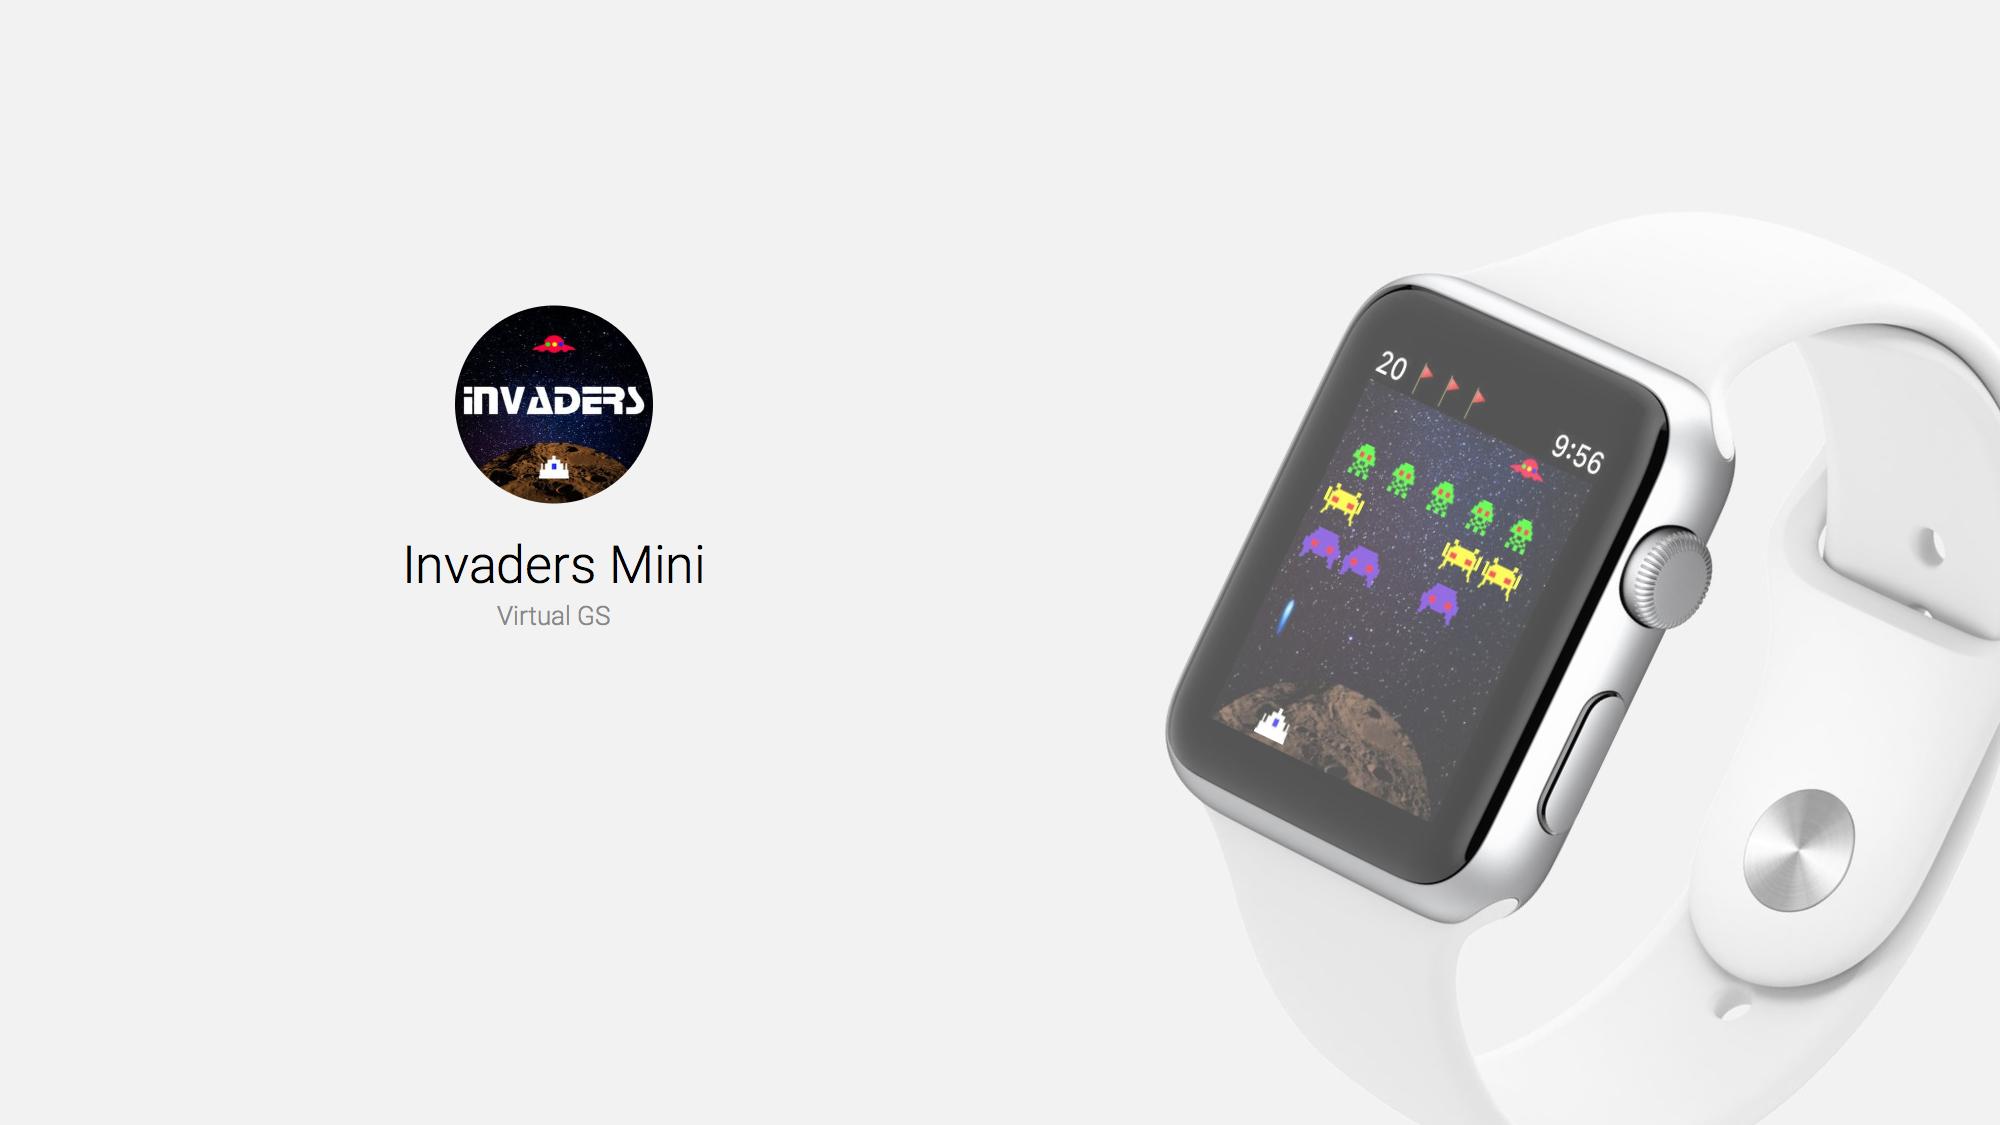 Invaders Mini Recalls Classic Arcade Game Space Invaders